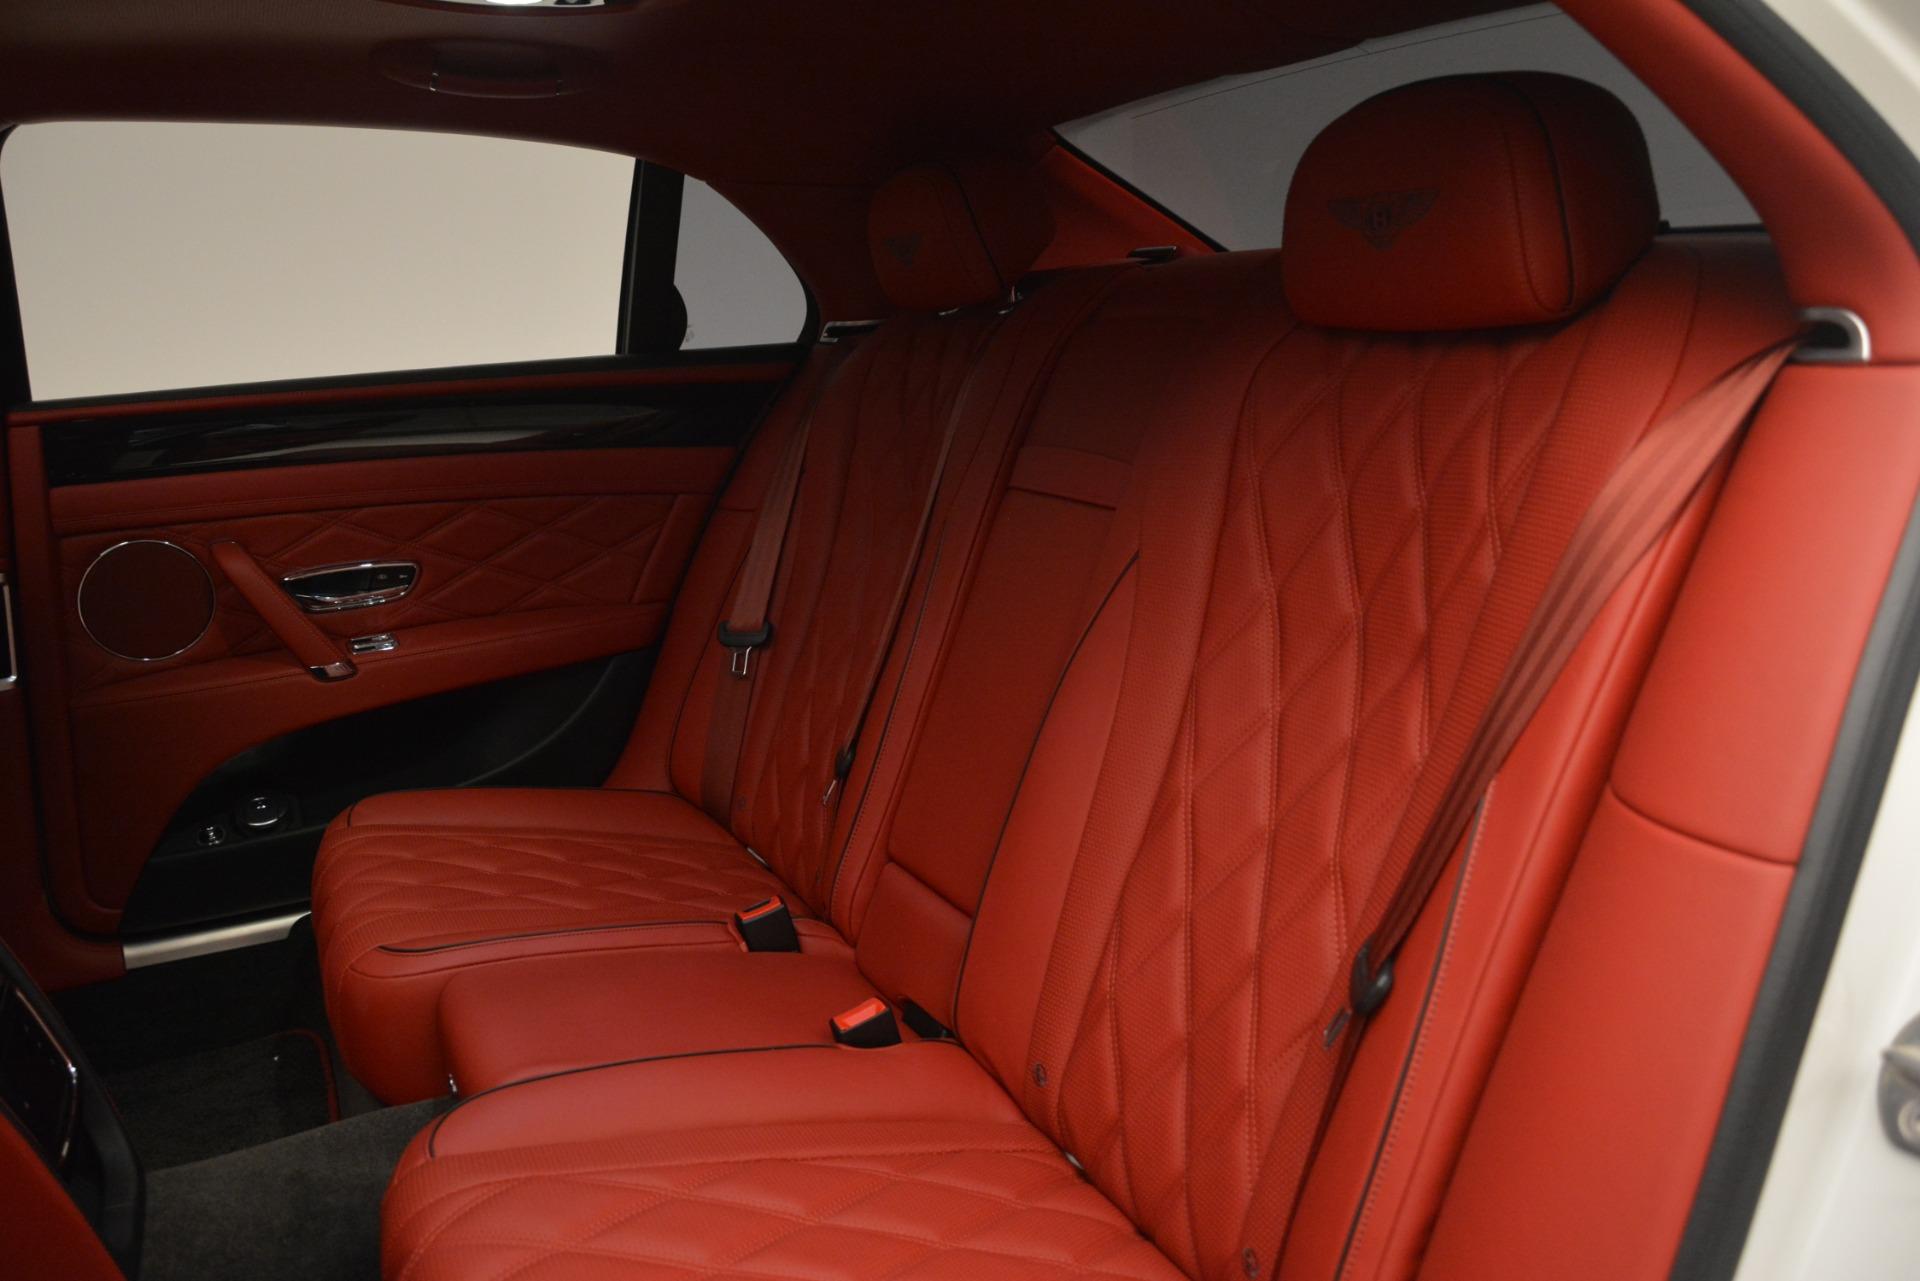 Used 2016 Bentley Flying Spur V8 For Sale In Westport, CT 3265_p23